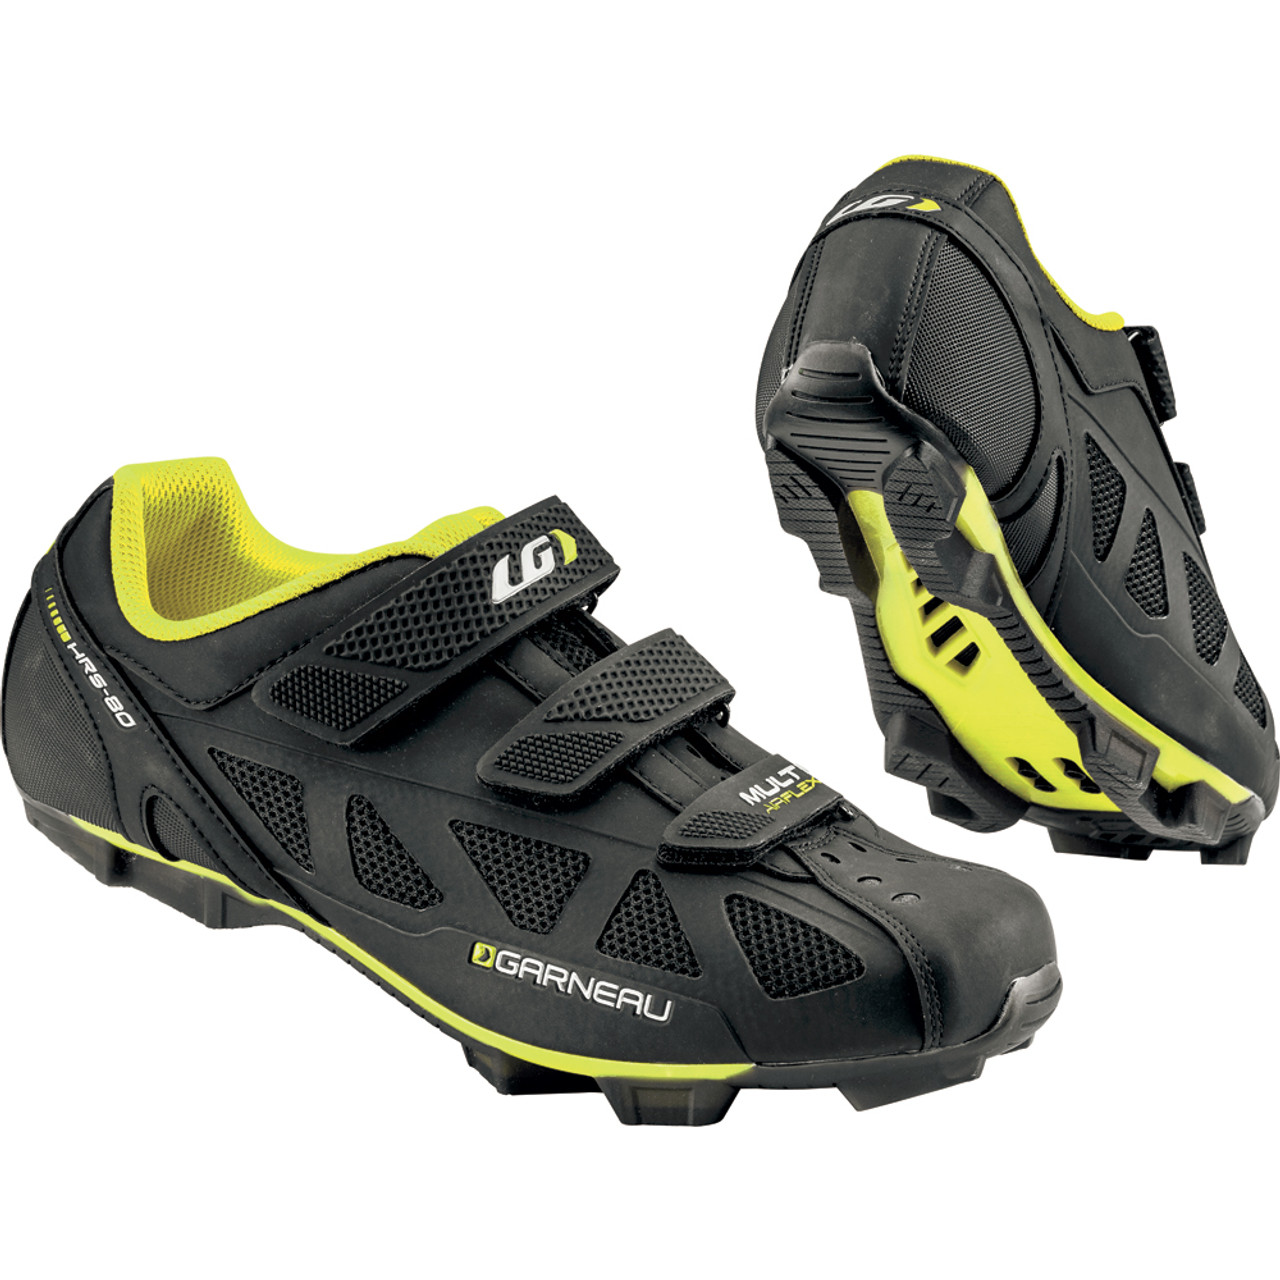 best place run shoes exquisite design Multi Air Flex Breathable Performance Cycling Shoes by Louis Garneau